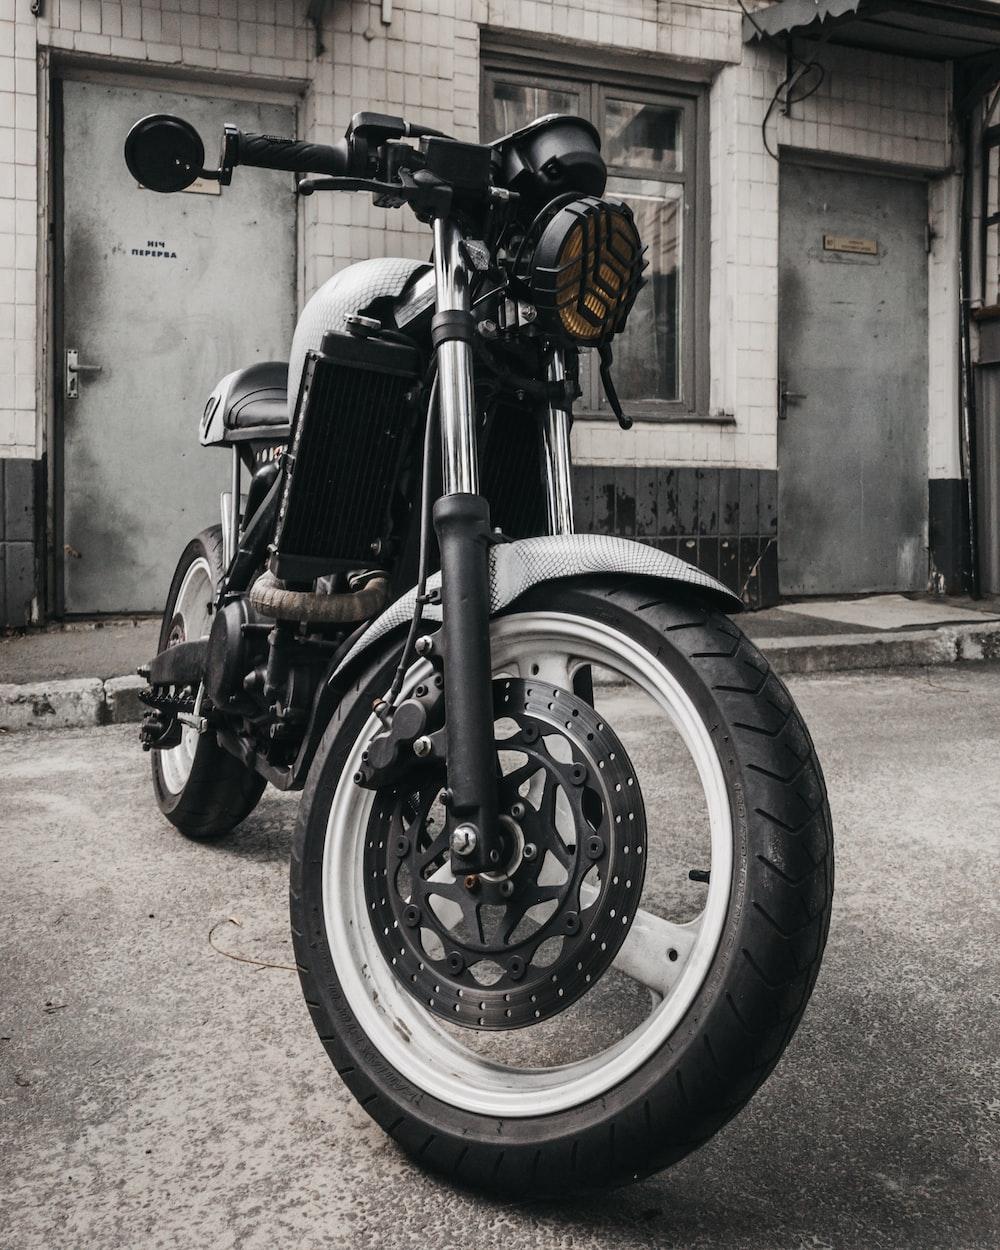 black motorcycle parking near building